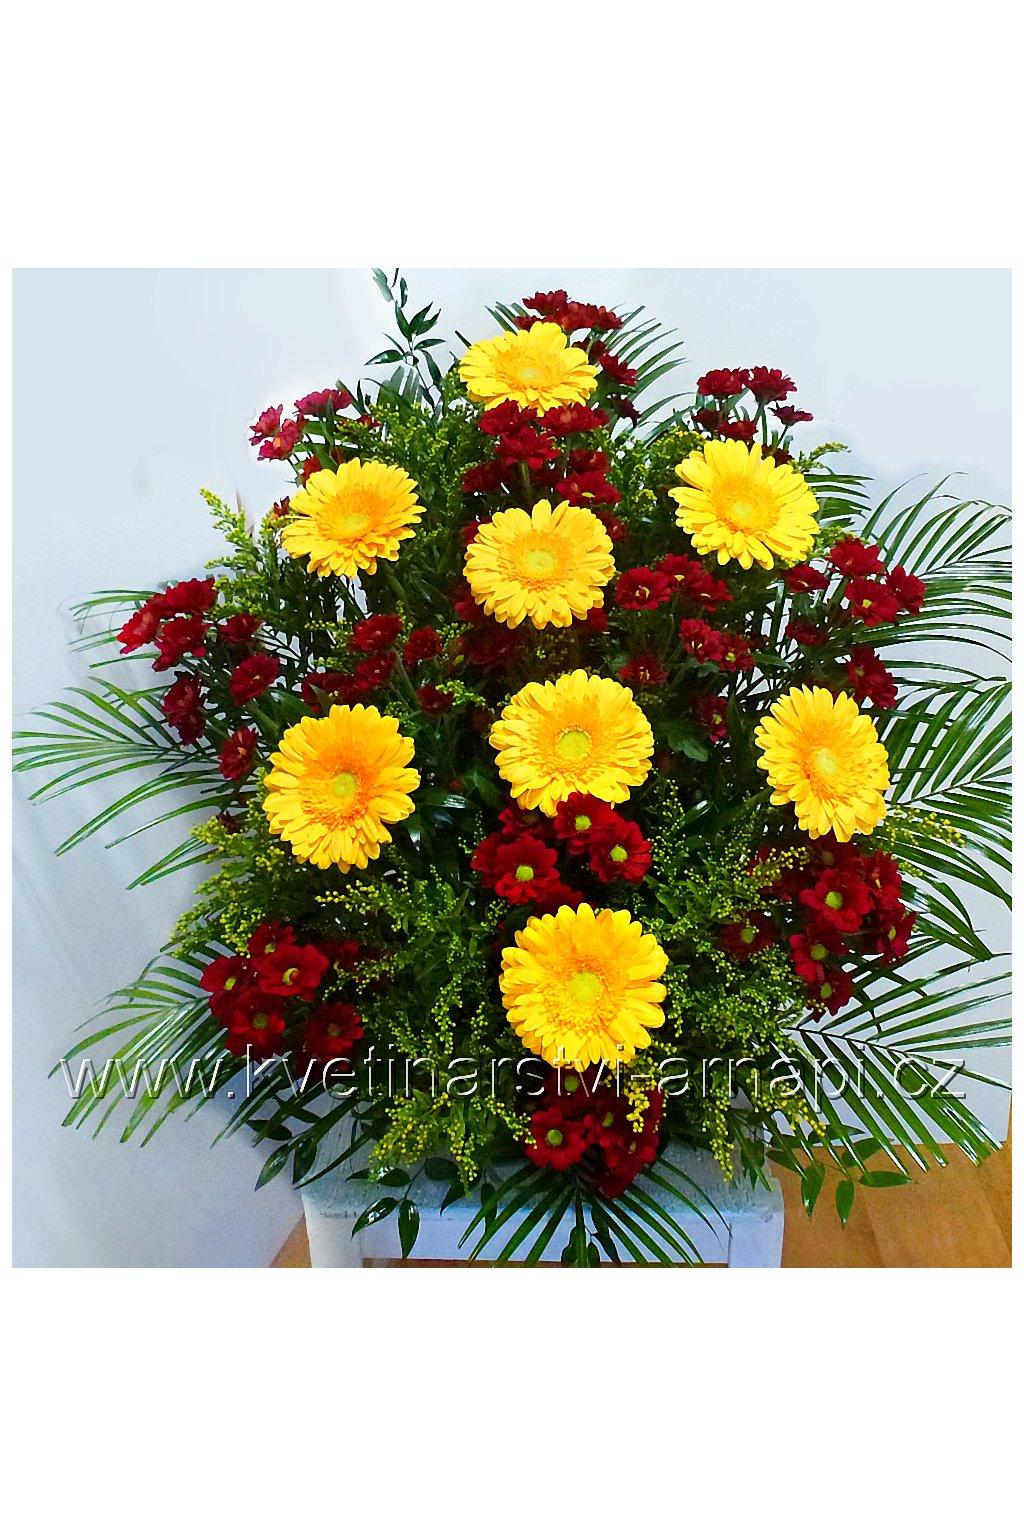 smutecni kytice do drzaku gerbery kvetinarstvi arnapi